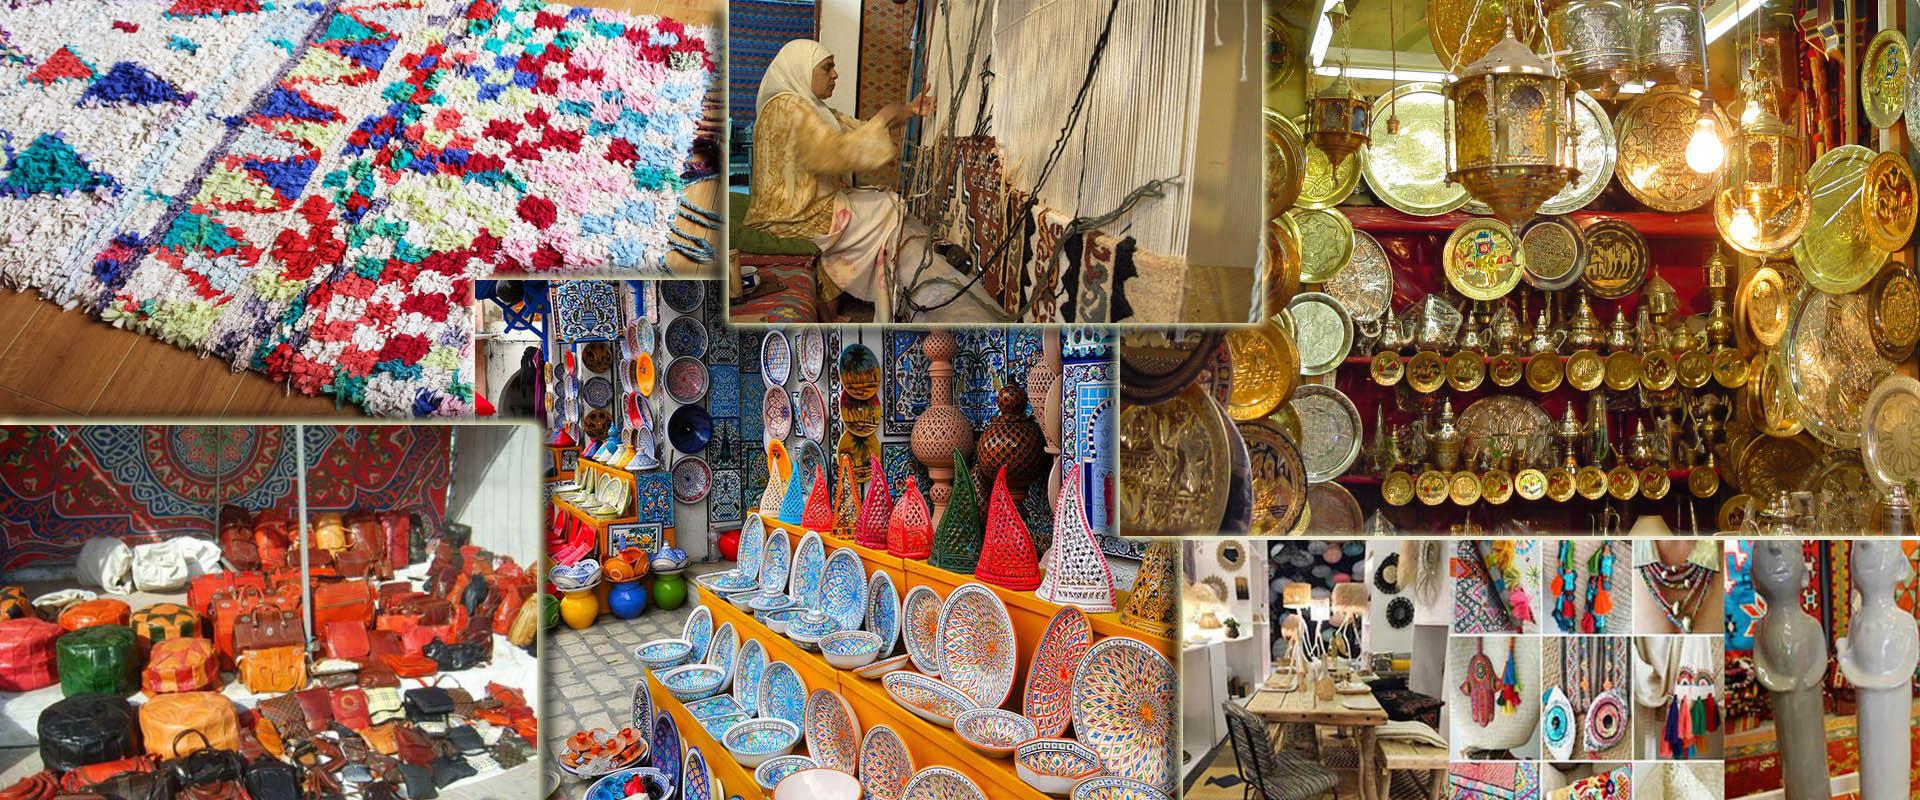 Vente export des produits artisanat en Tunisie : Universallys